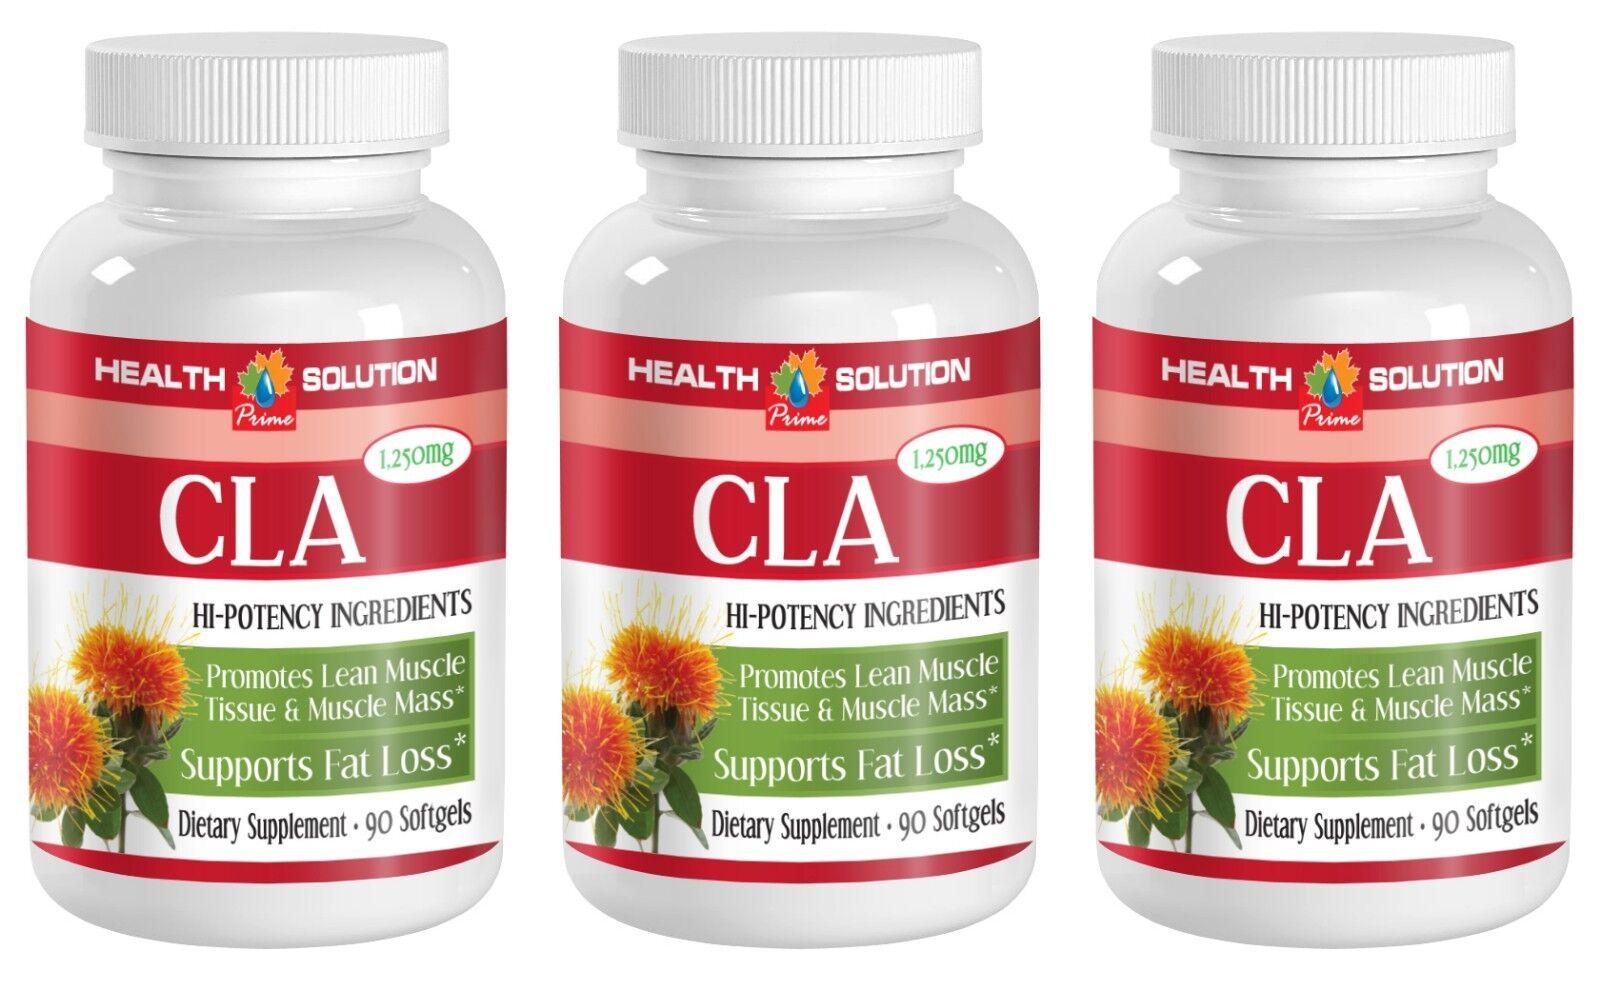 energy boost supplement for women - CLA 3B - cla weight loss